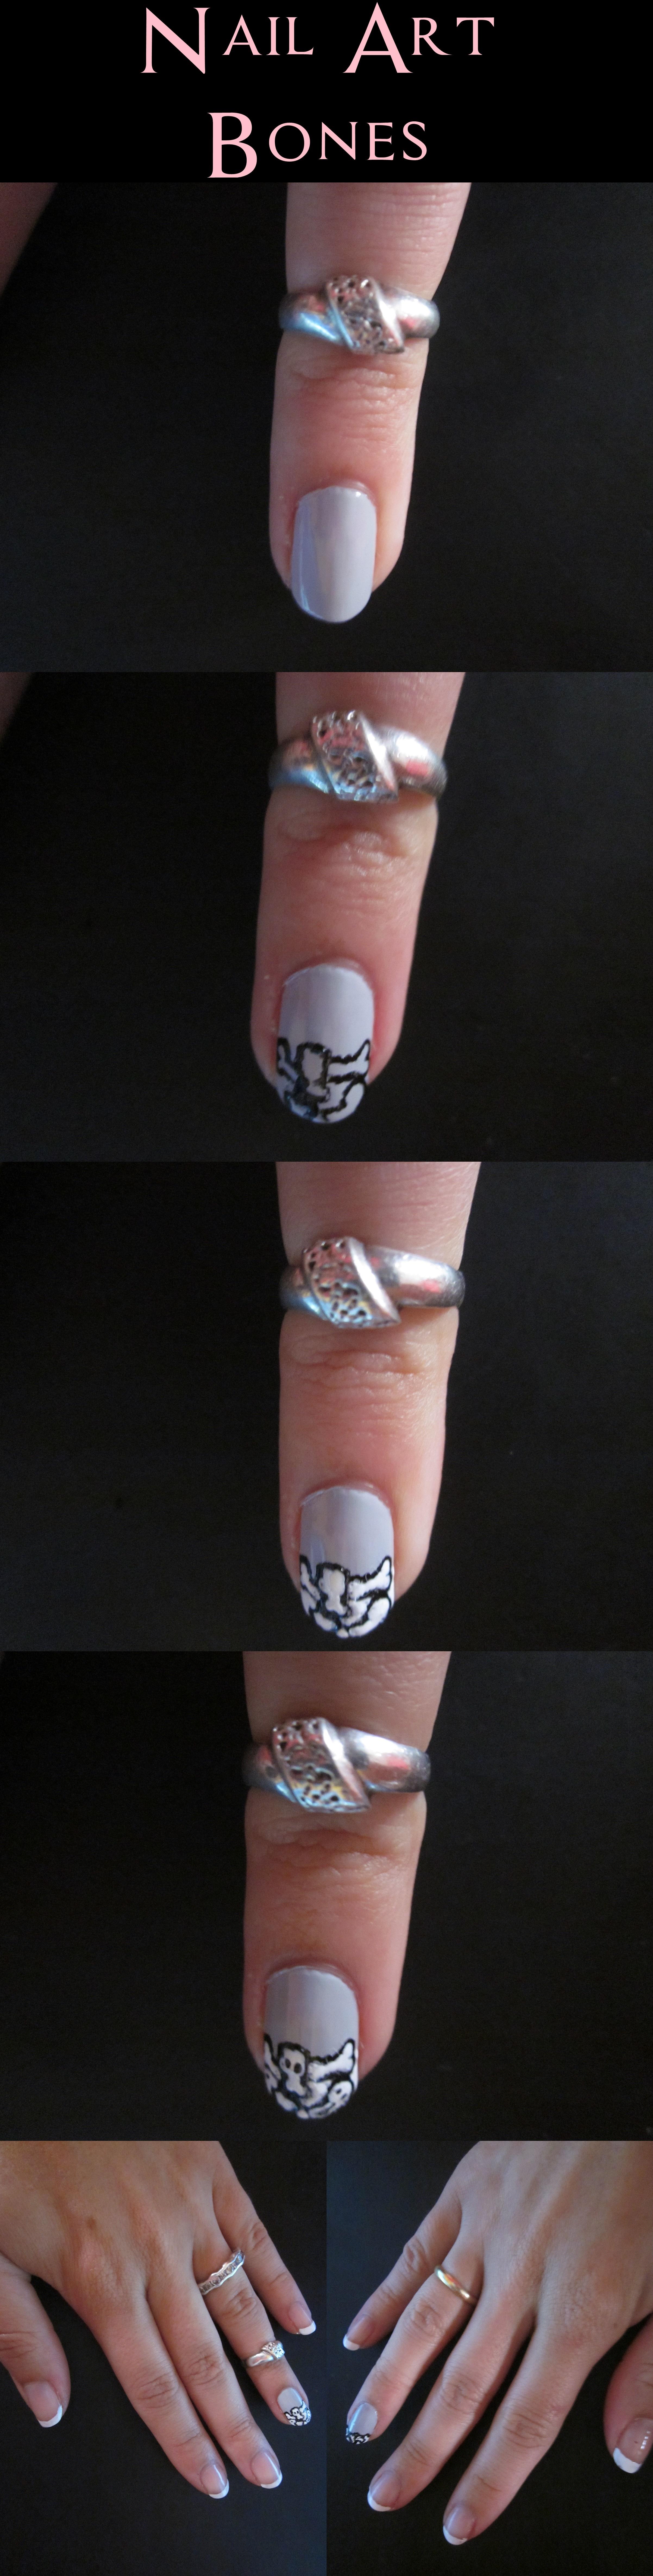 Nail Art - Bones